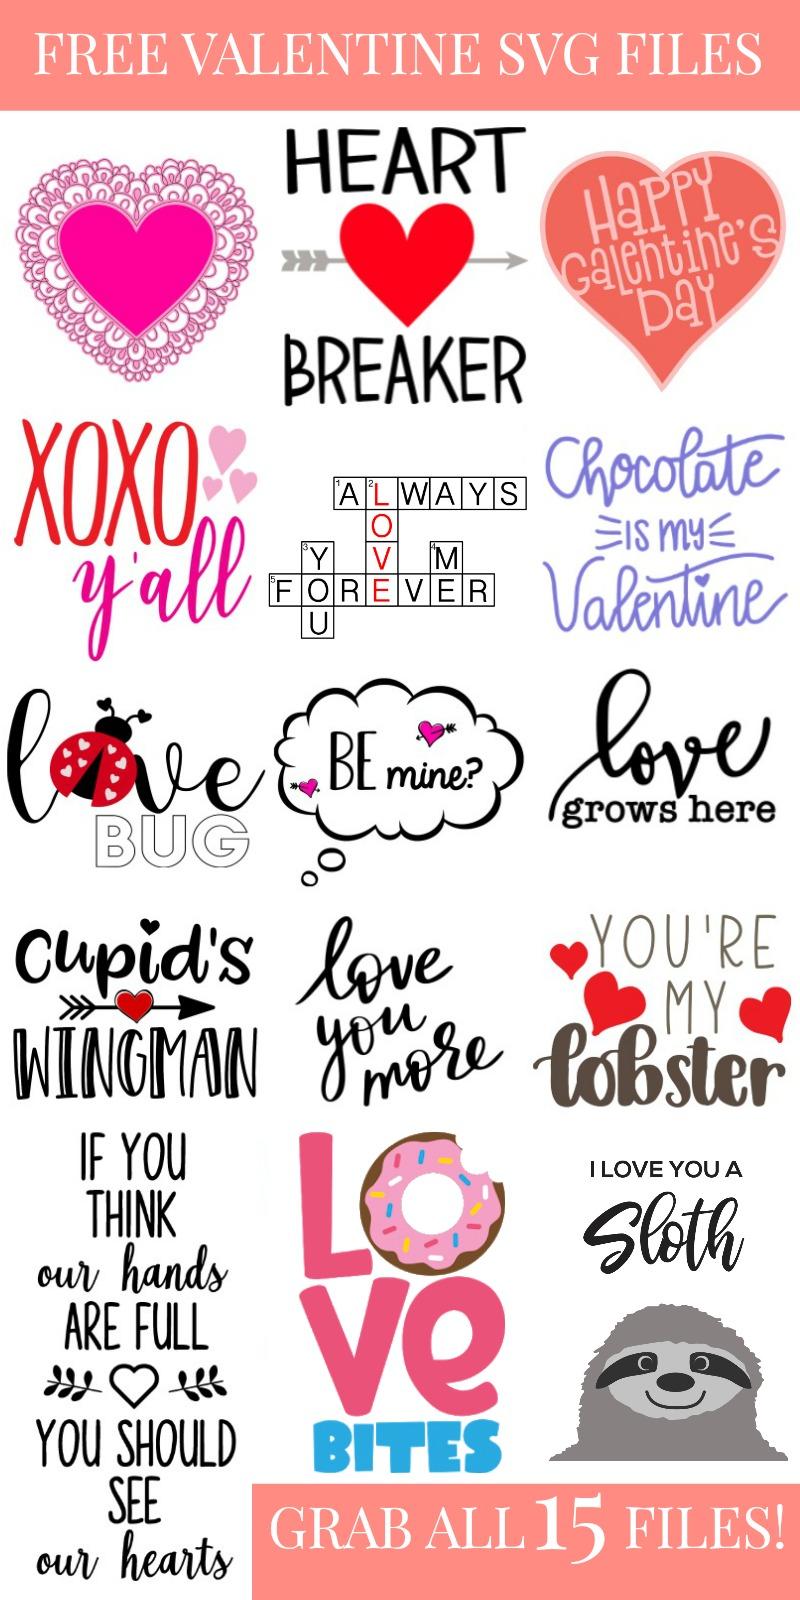 Valentine's Day SVG FILES COLLAGE